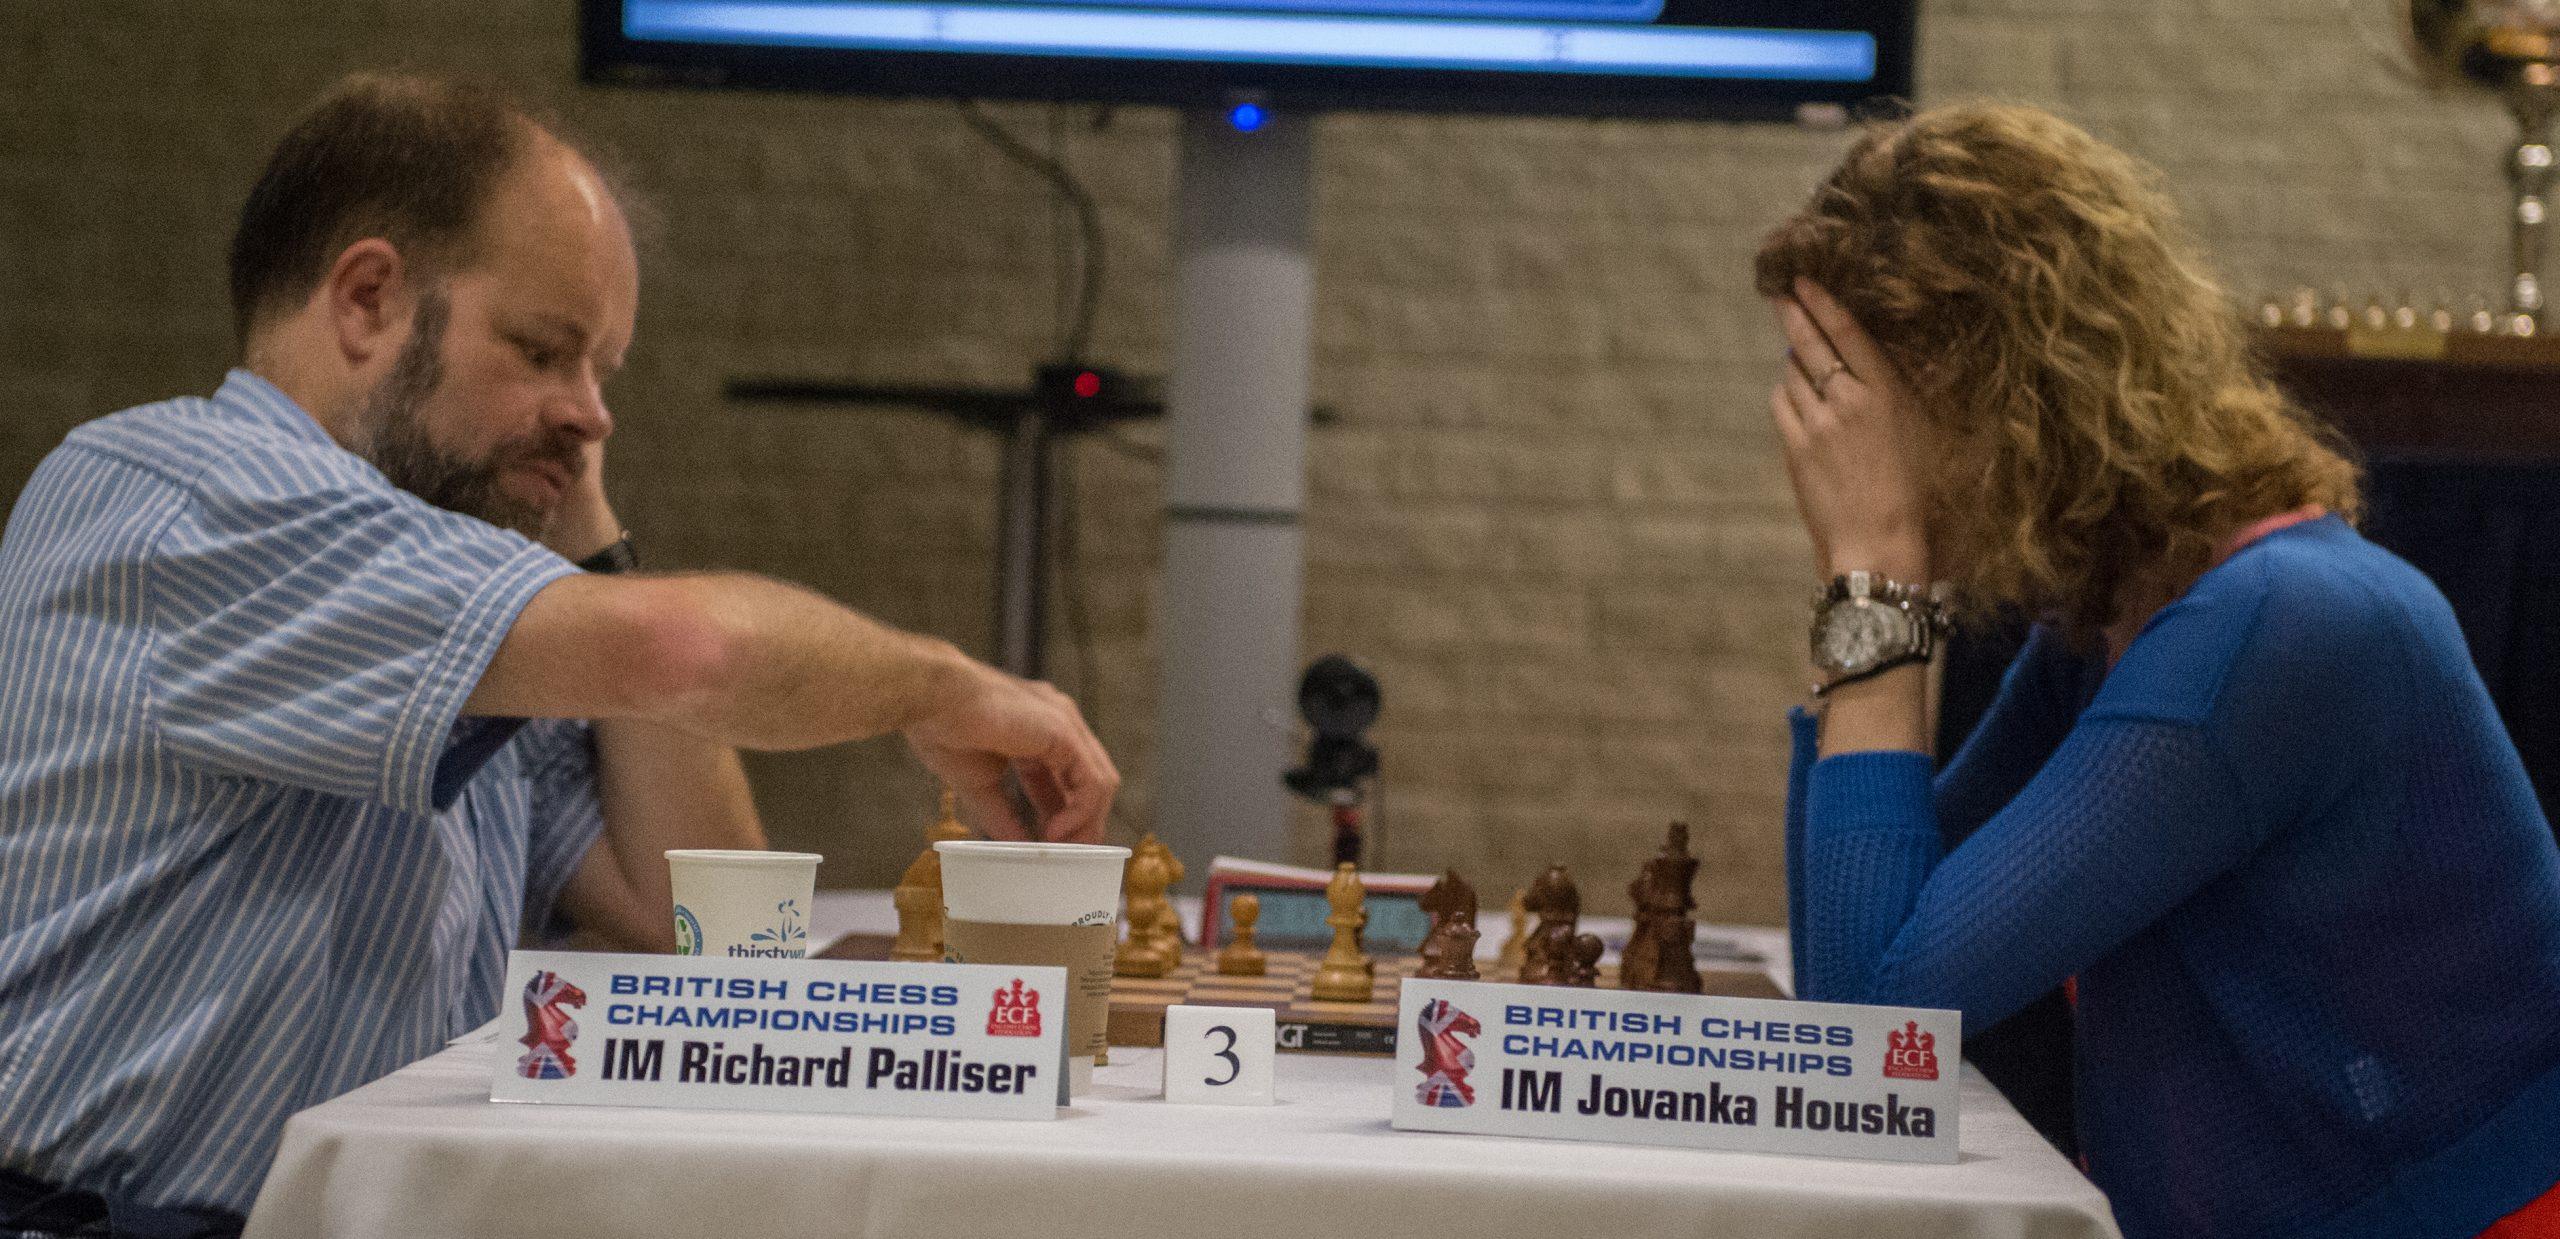 IM Richard Palliser and IM Jovanka Houska, British Championships, 2019